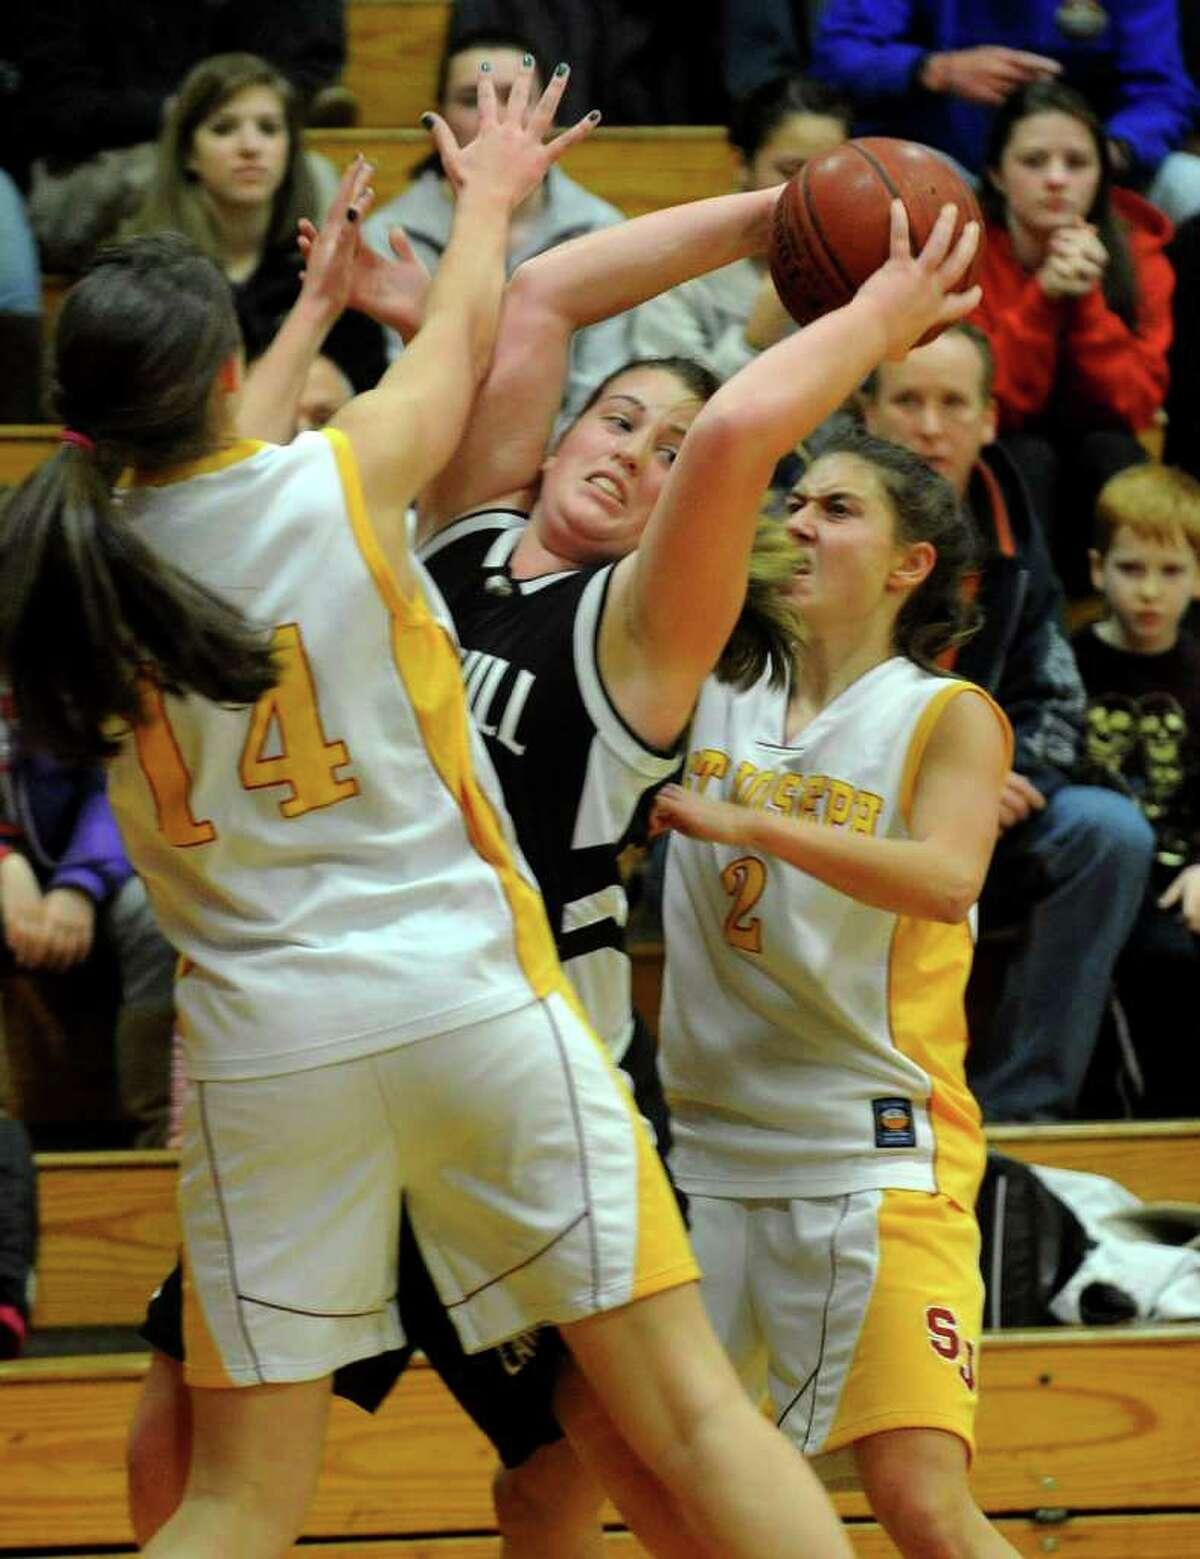 High school girls basketball: Where has the game gone?